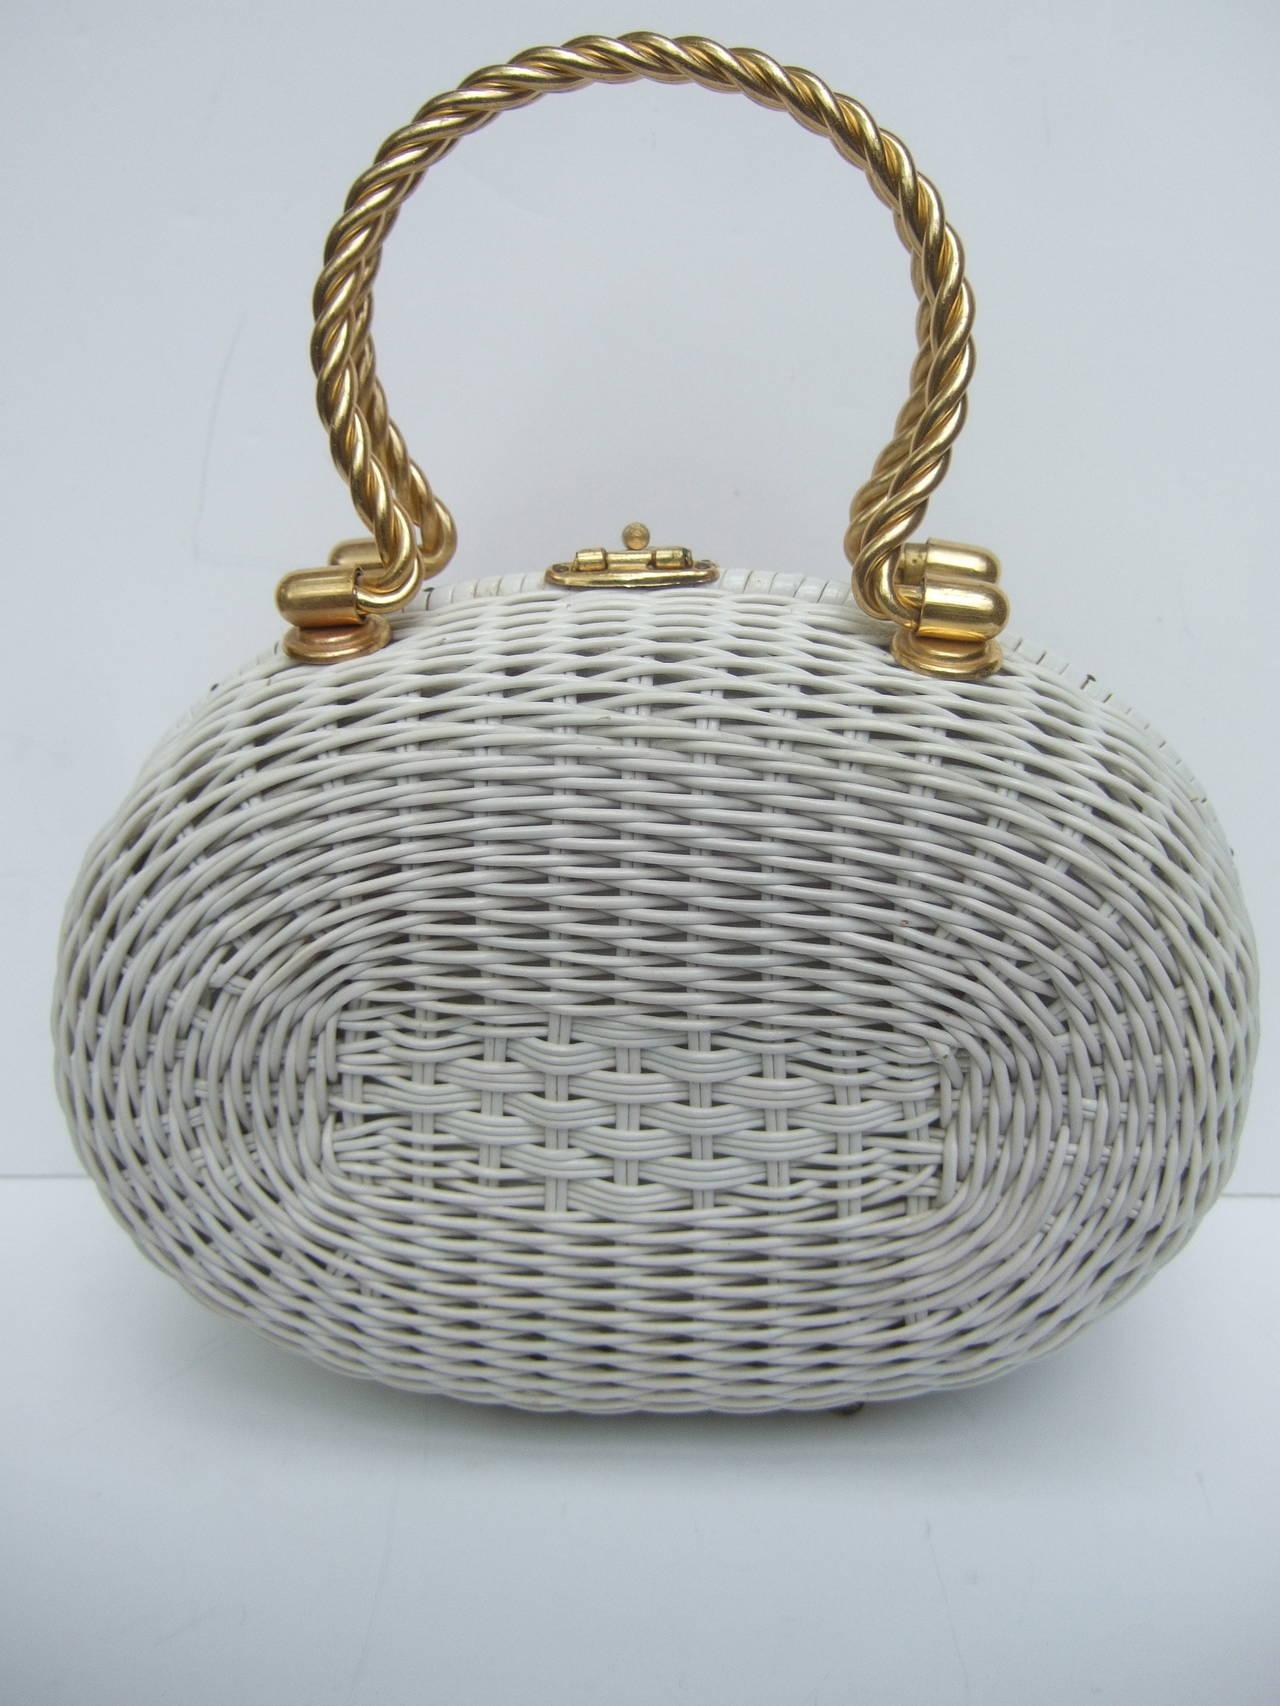 Posh Sea Shell White Wicker Retro Handbag c 1960 6